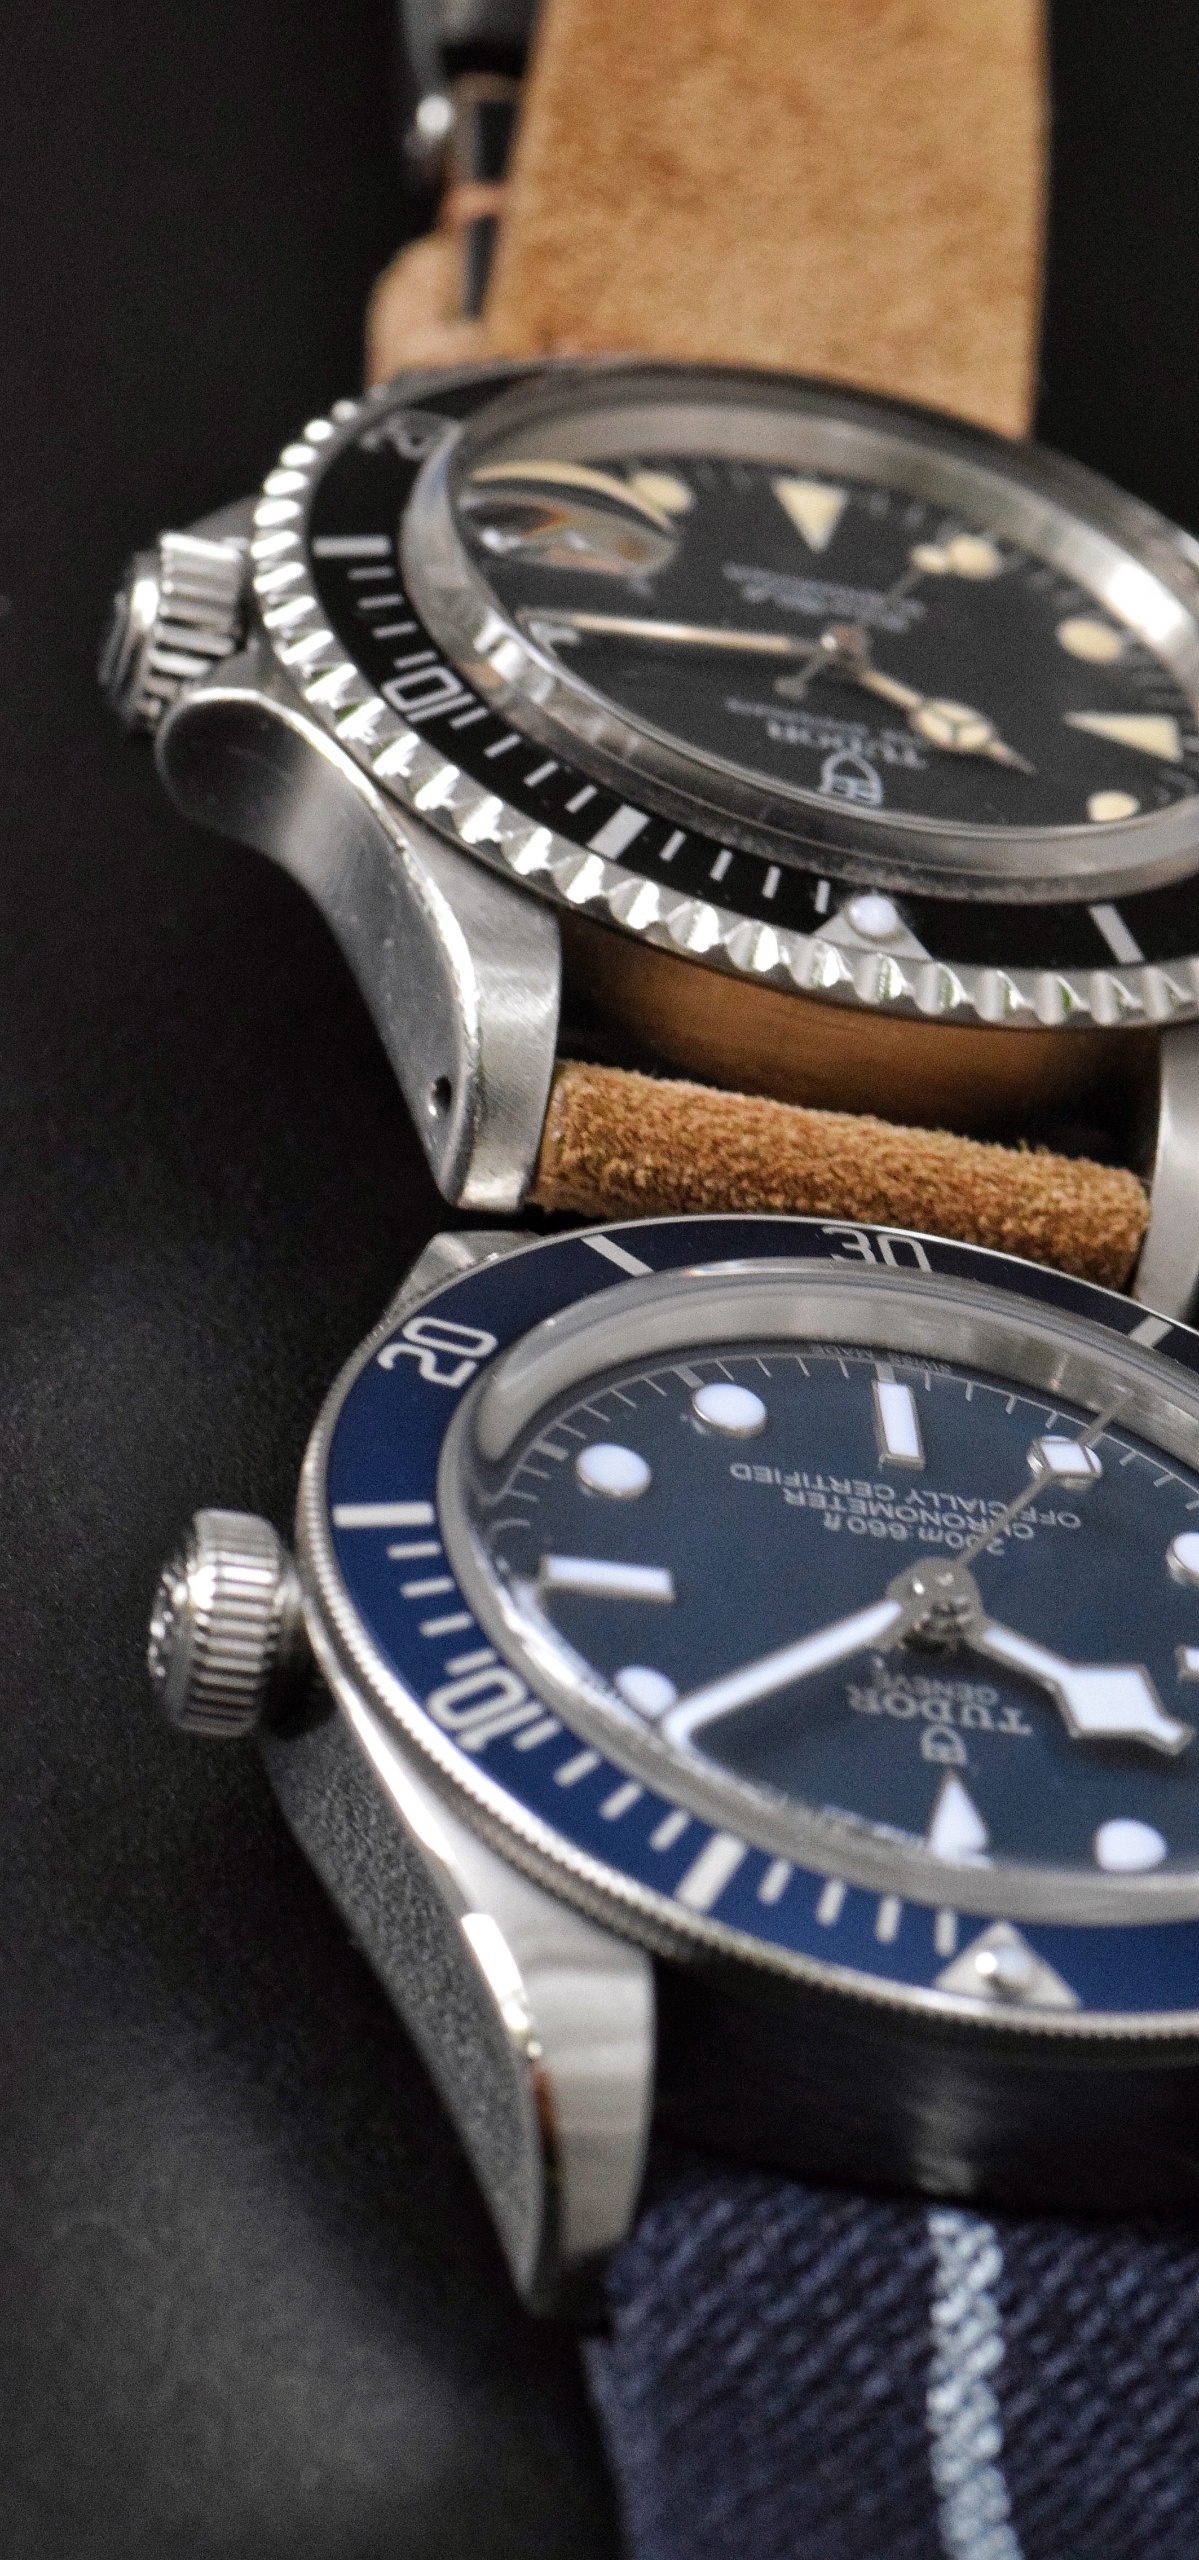 Tudor Black Bay 58 Blue compared to 1992 Tudor Submariner